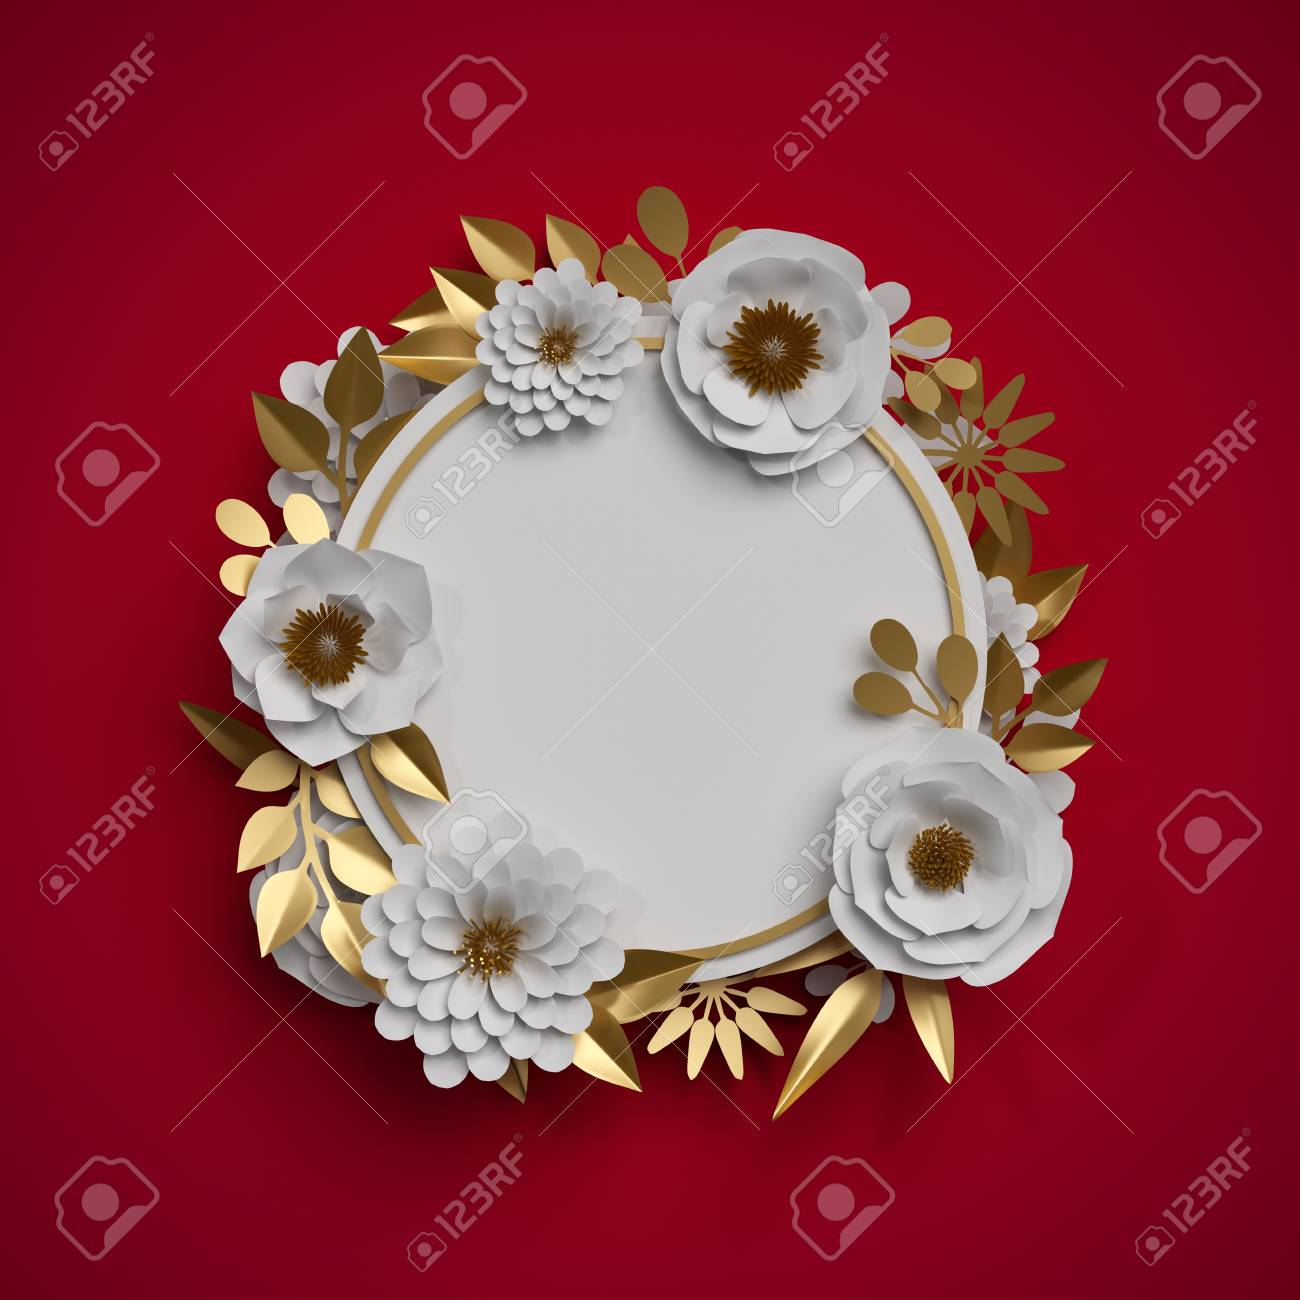 3d Render Paper Flowers Round Frame Red White Gold Botanical